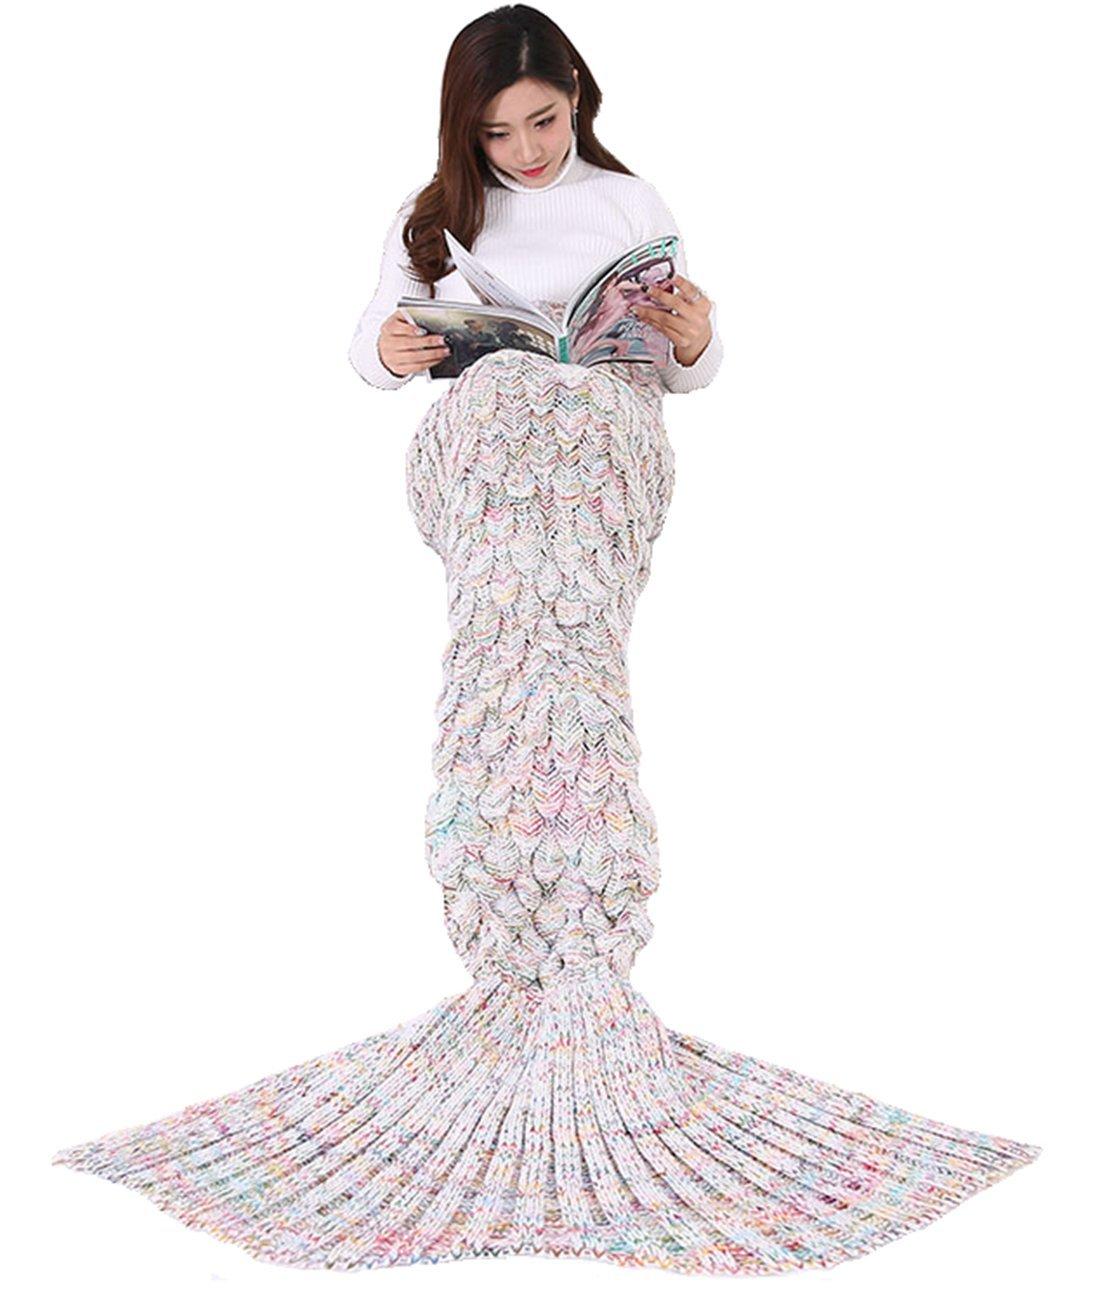 Mermaid Tail Blanket with Scale Knit Crochet Mermaid Blanket for Adult,Teenagers,Kids,Soft Living Room Sofa Sleeping Blankets Sleeping Bags,All Seasons Warm Bed Blankets (White, 76'' x 37'' 1.65lb)